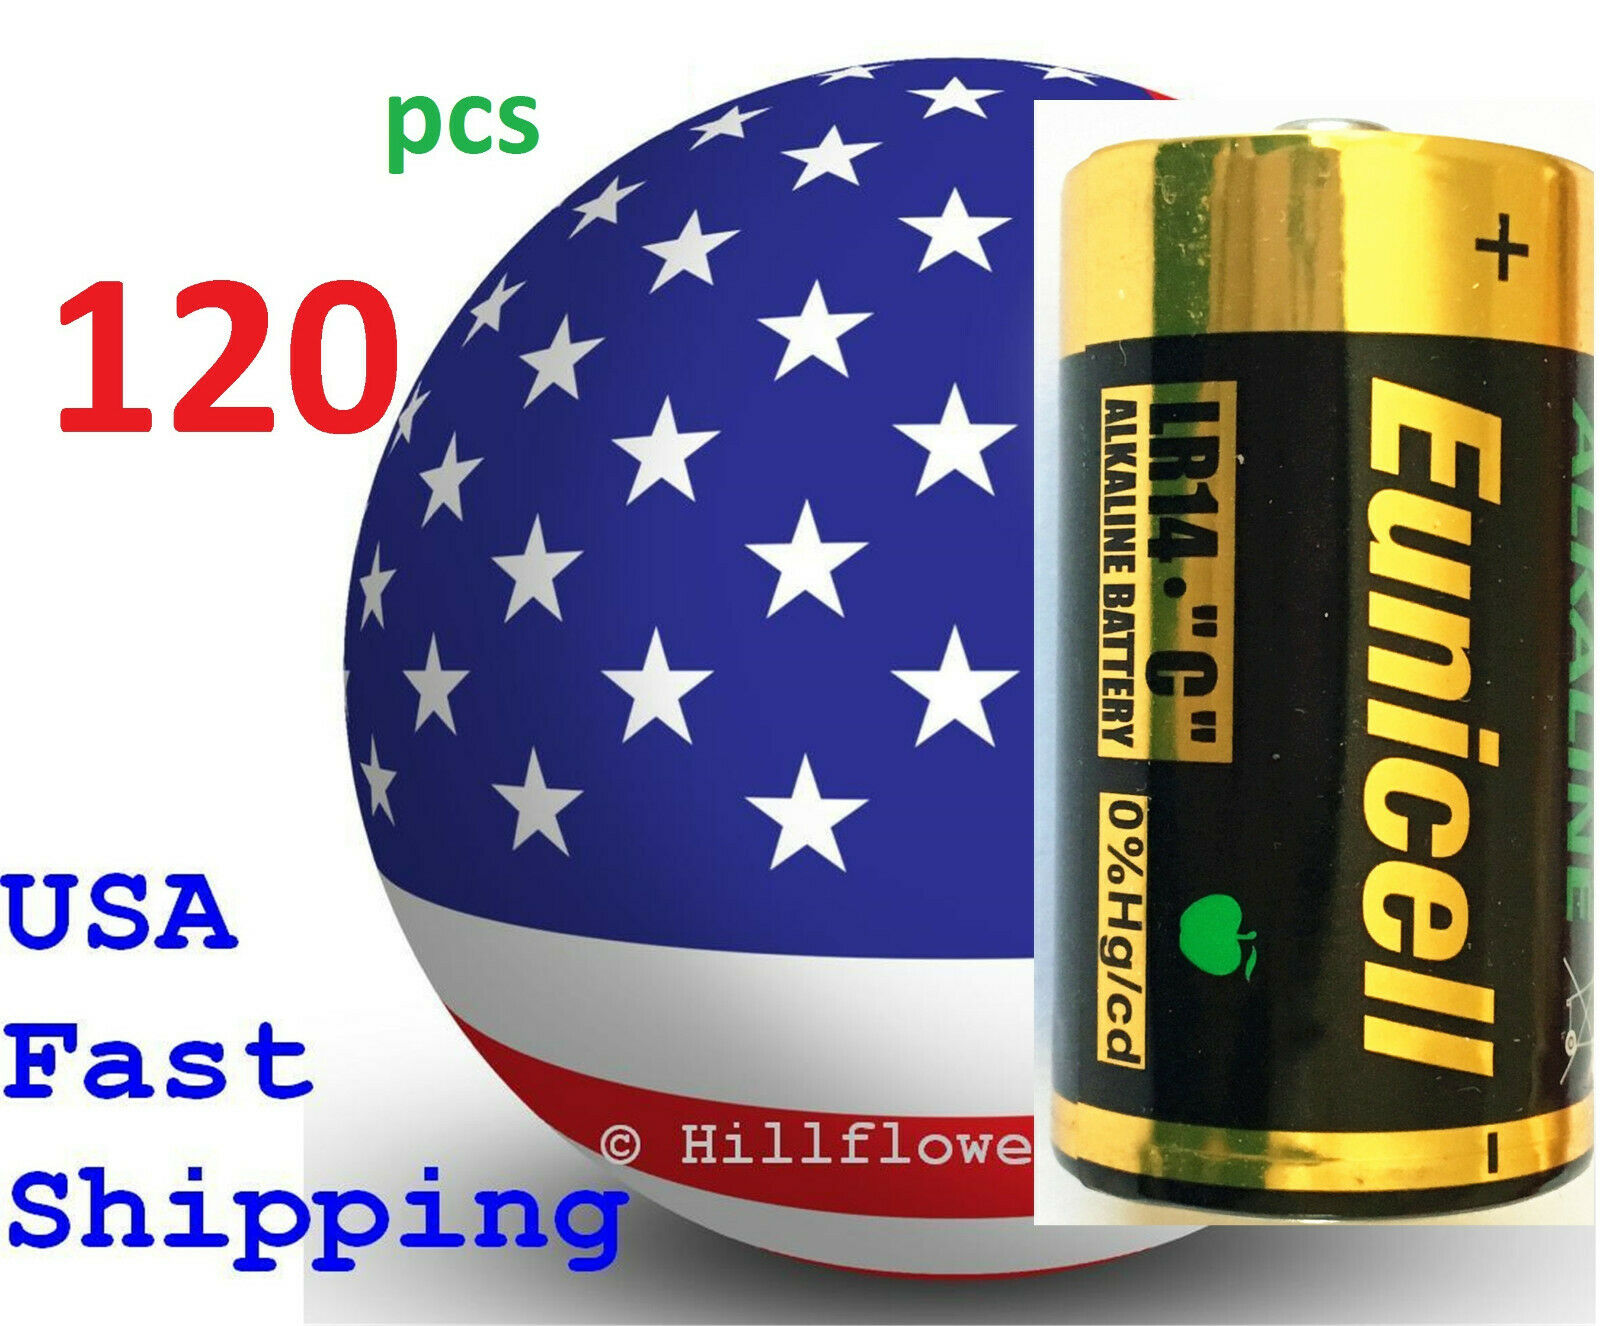 120 pcs Size C LR14 MN1400 EN93 0%Hg Heavy Duty Bulk 1.5V Alkaline Battery